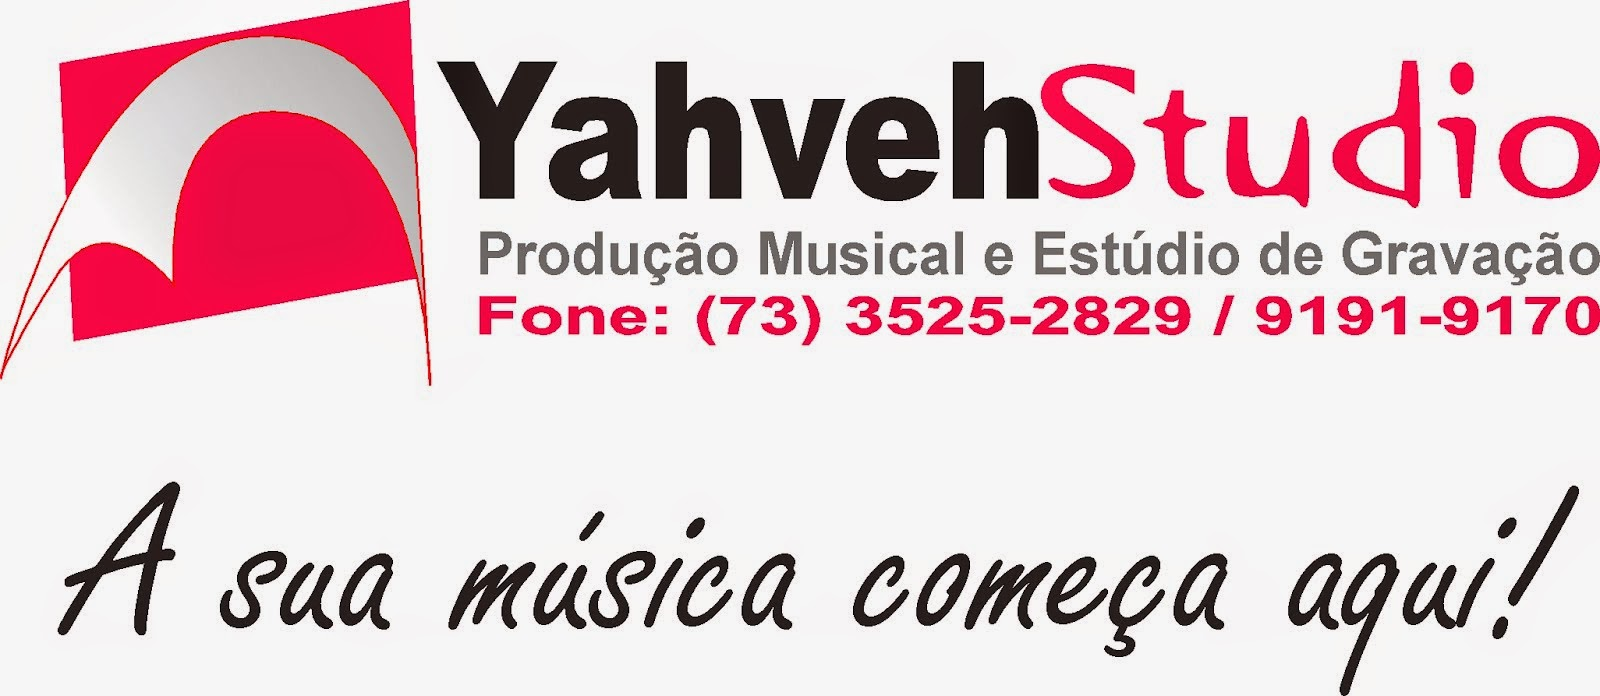 Yahveh Studio